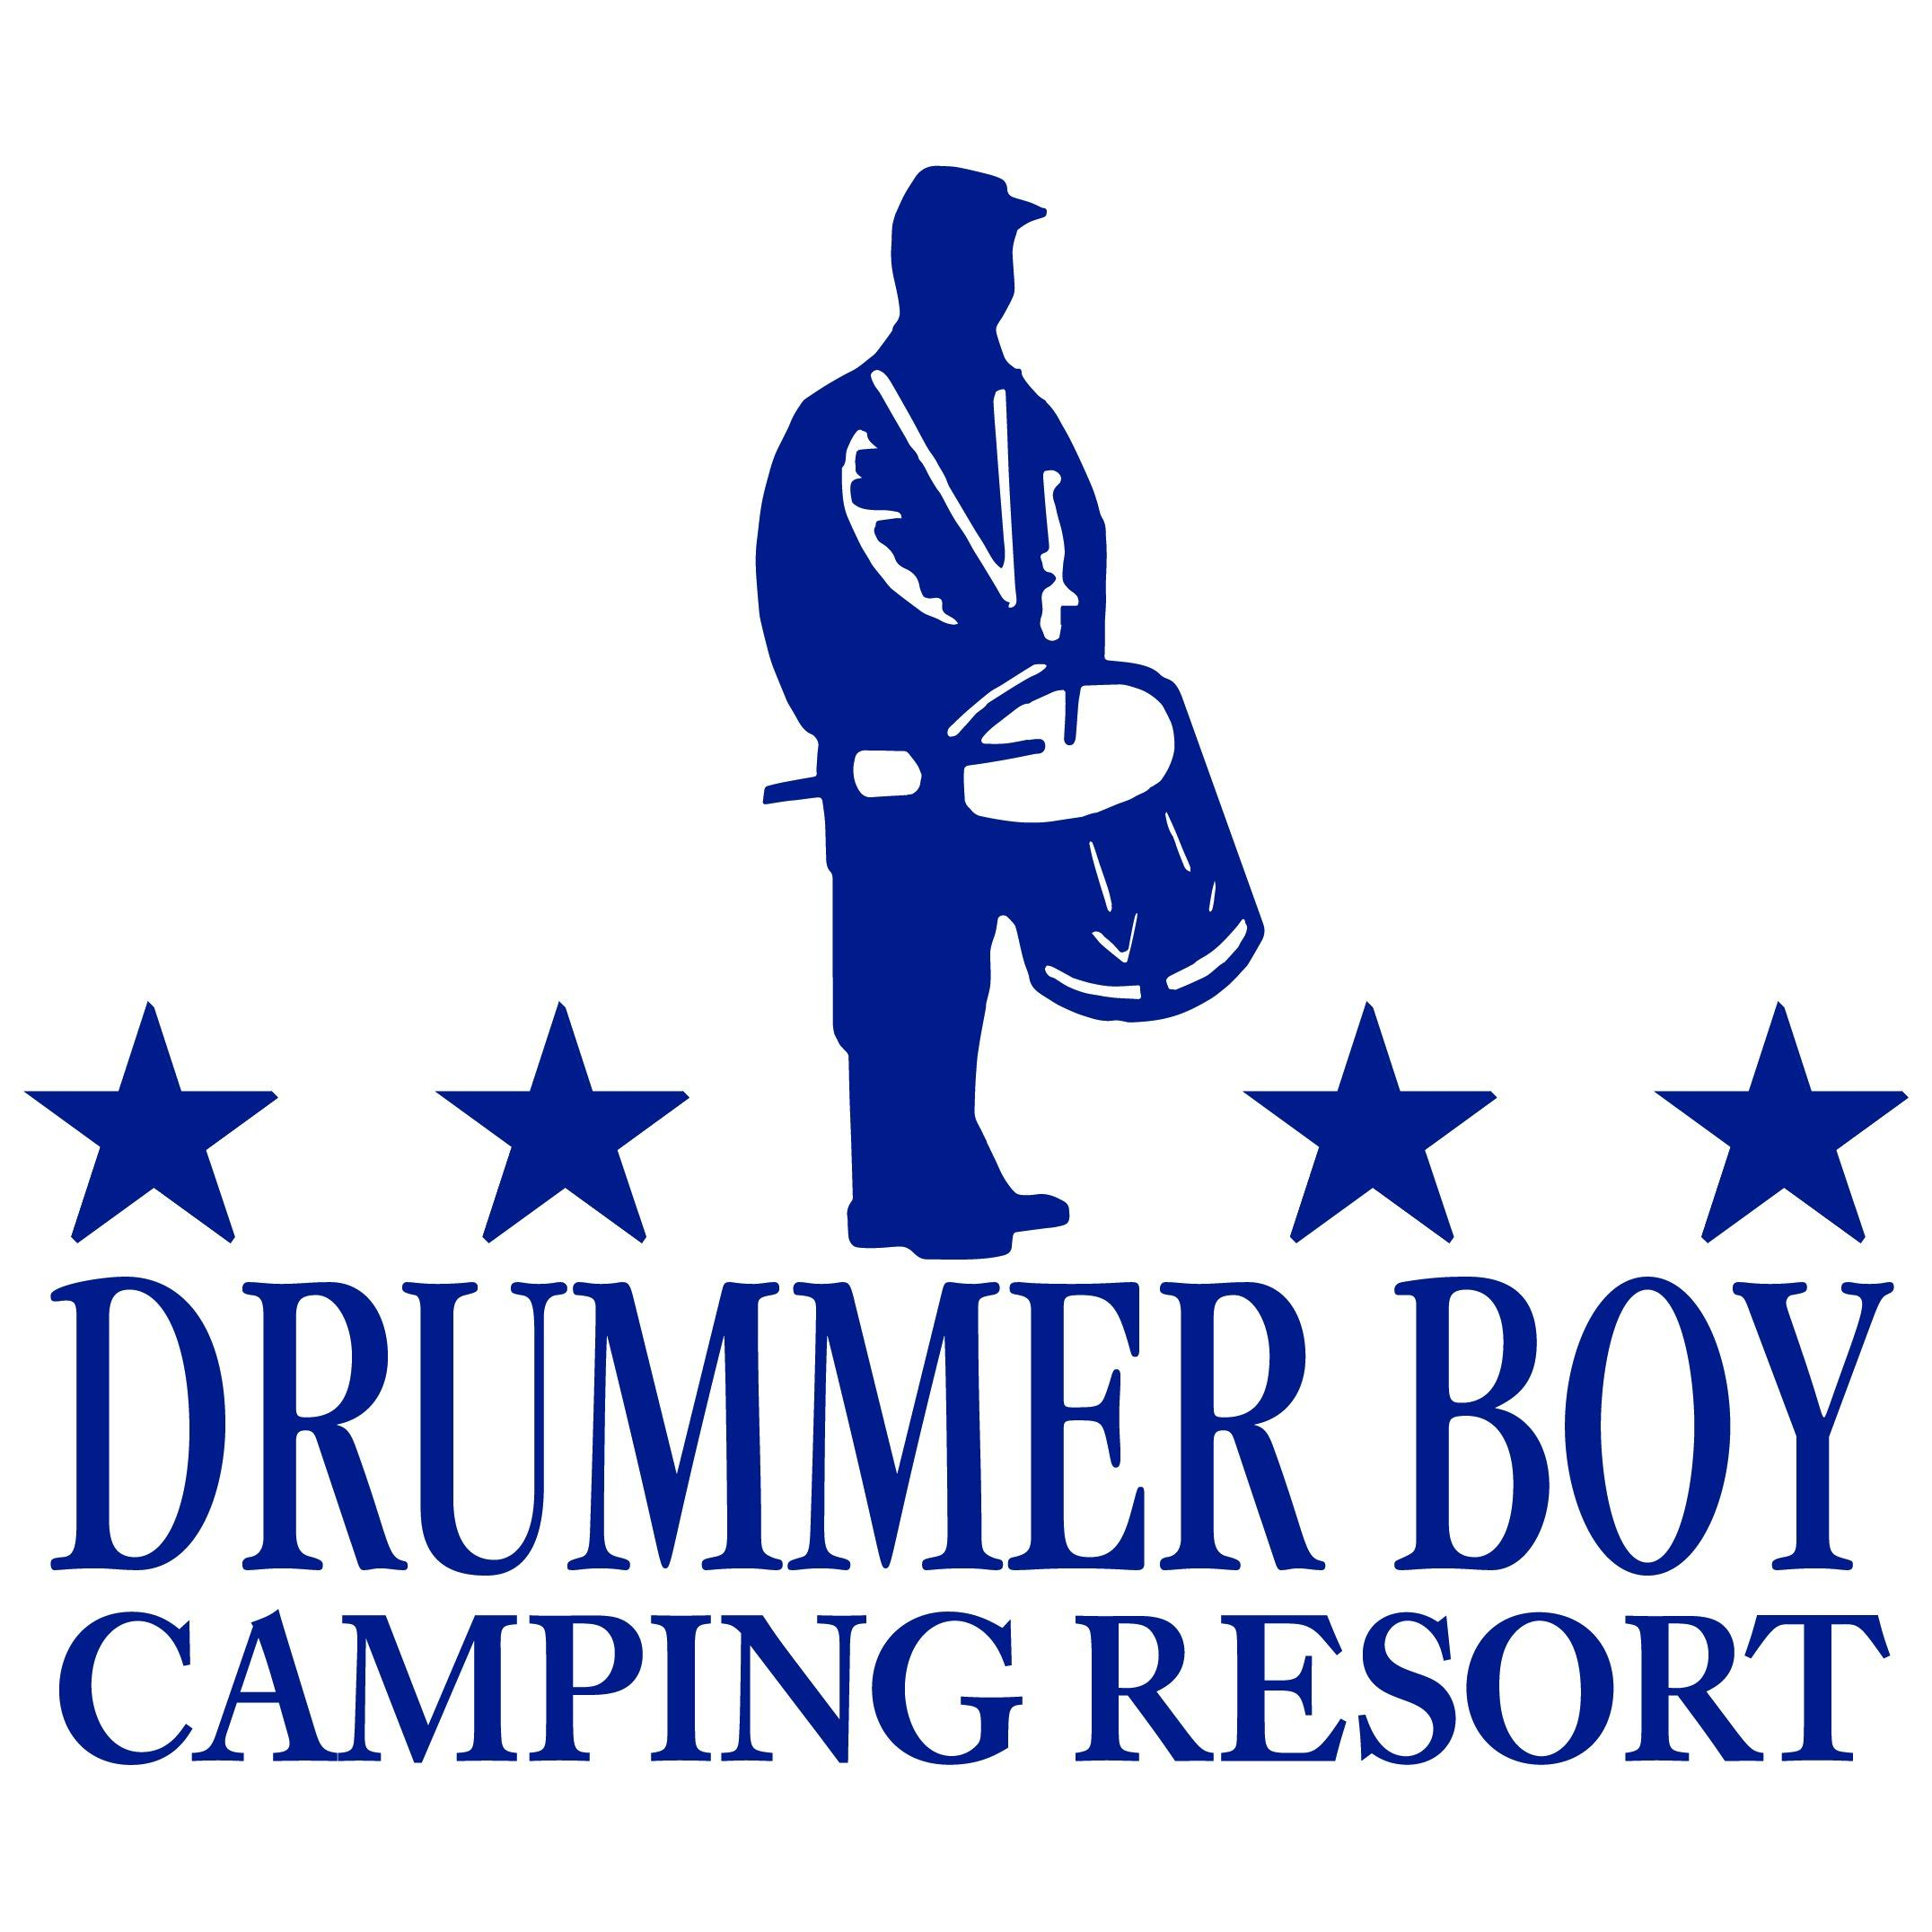 Drummer Boy RV Resort